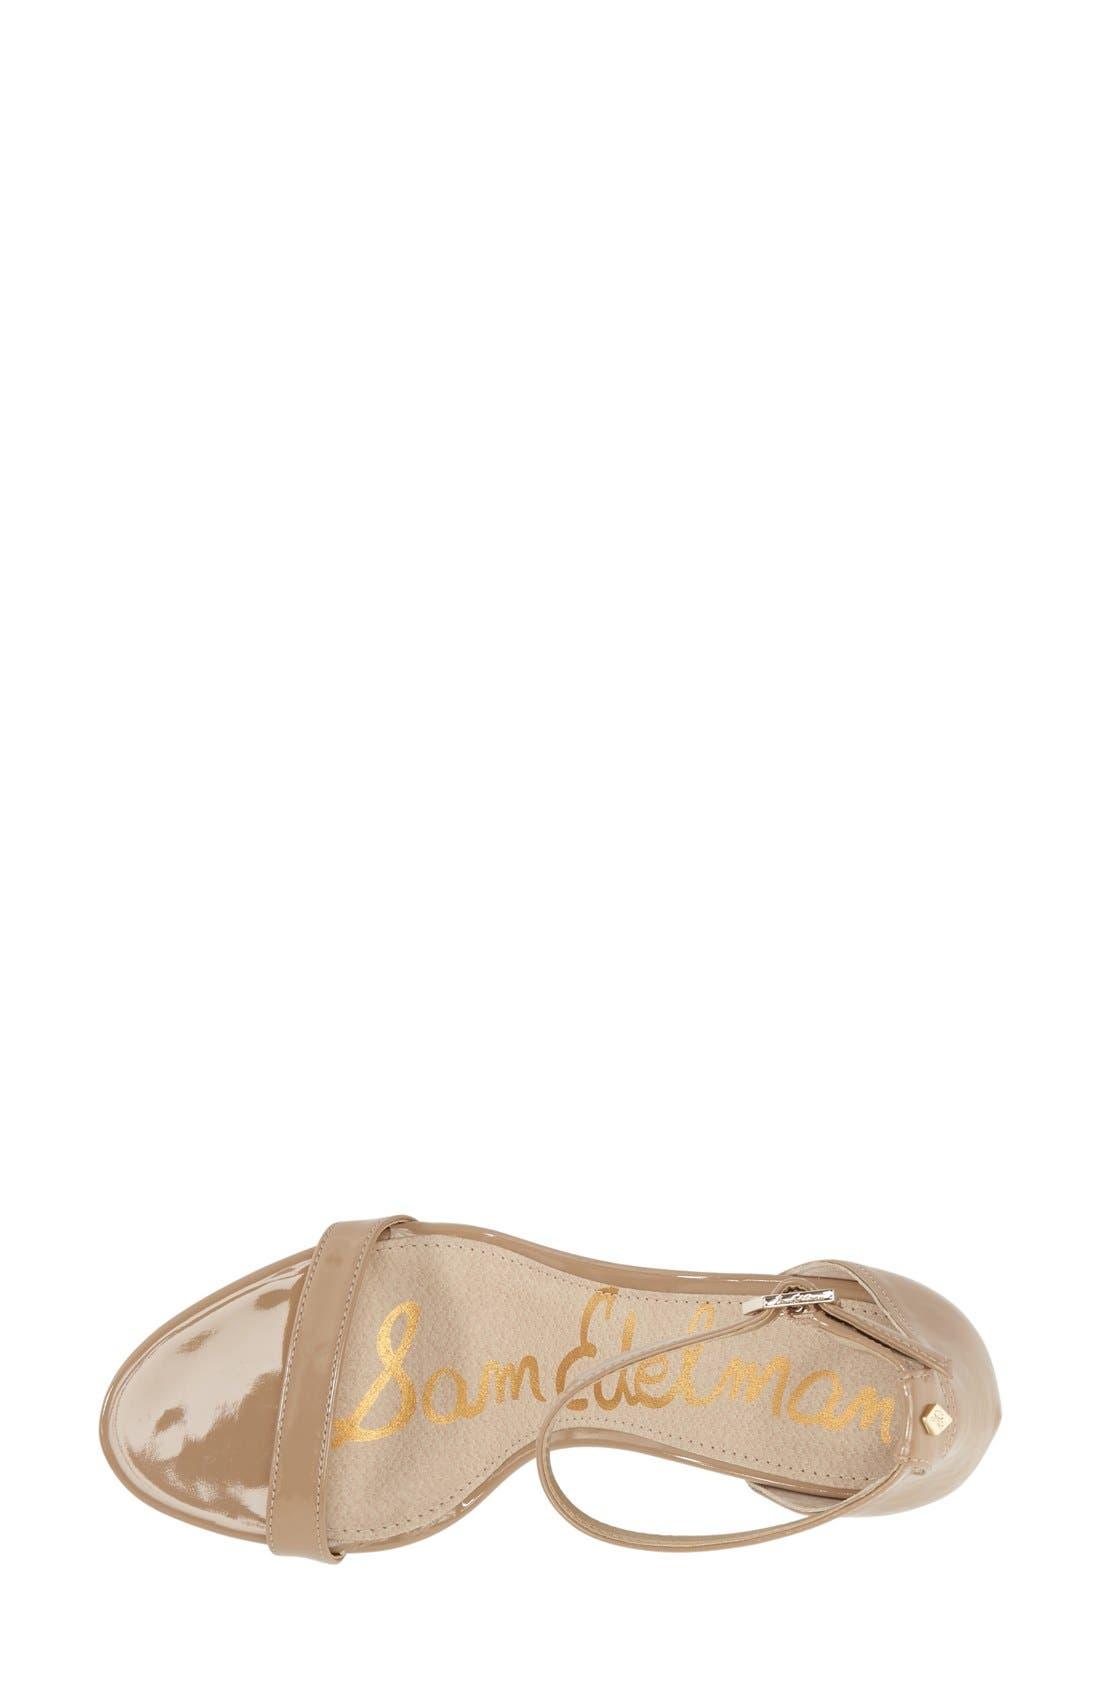 ,                             'Patti' Ankle Strap Sandal,                             Alternate thumbnail 182, color,                             252